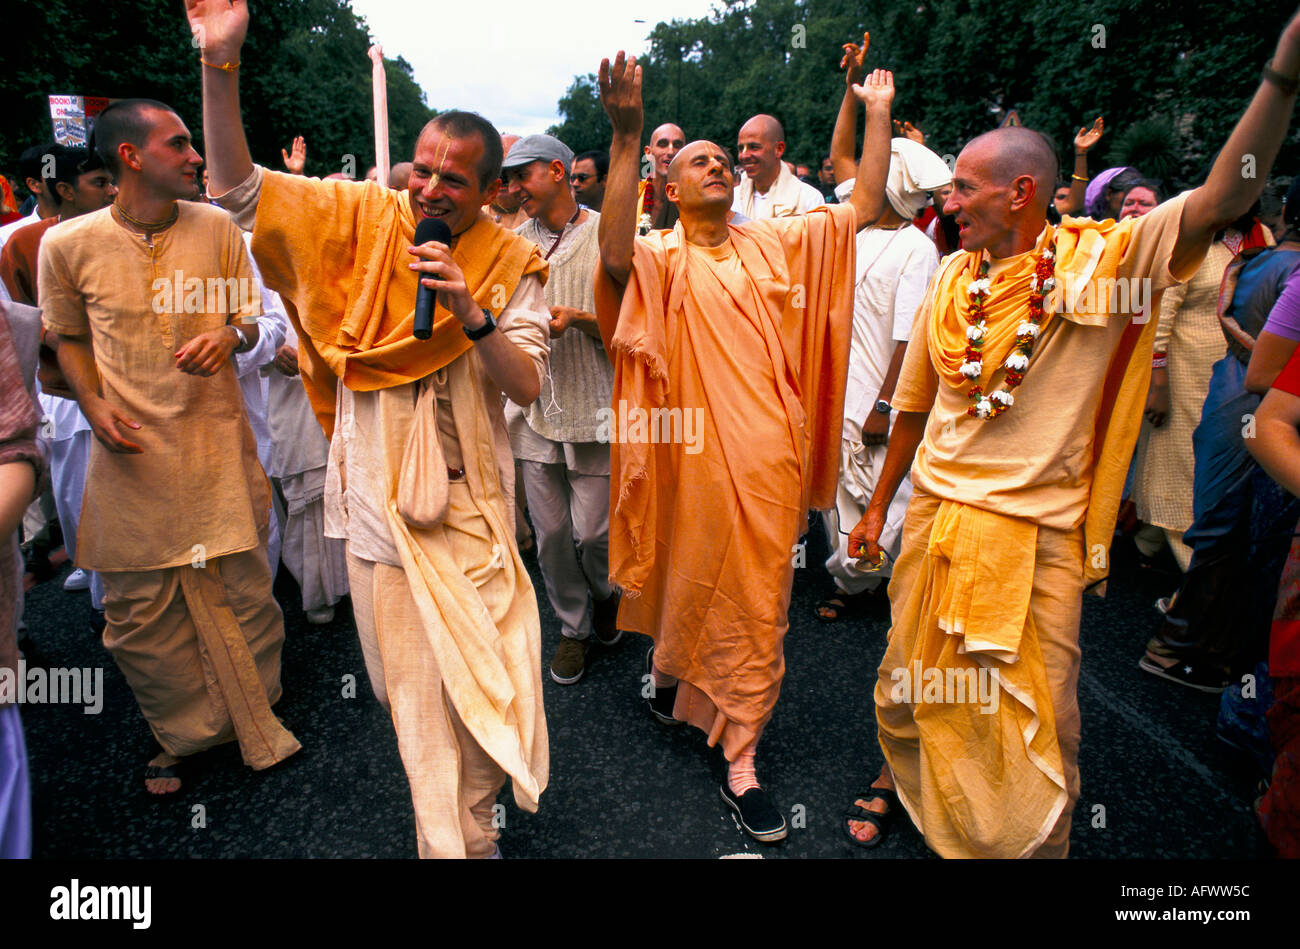 Hare Krishna Uk fête hindoue Ratha Jatra ou Rathayatra ou festival de char Londres, en Angleterre. HOMER SYKES Banque D'Images